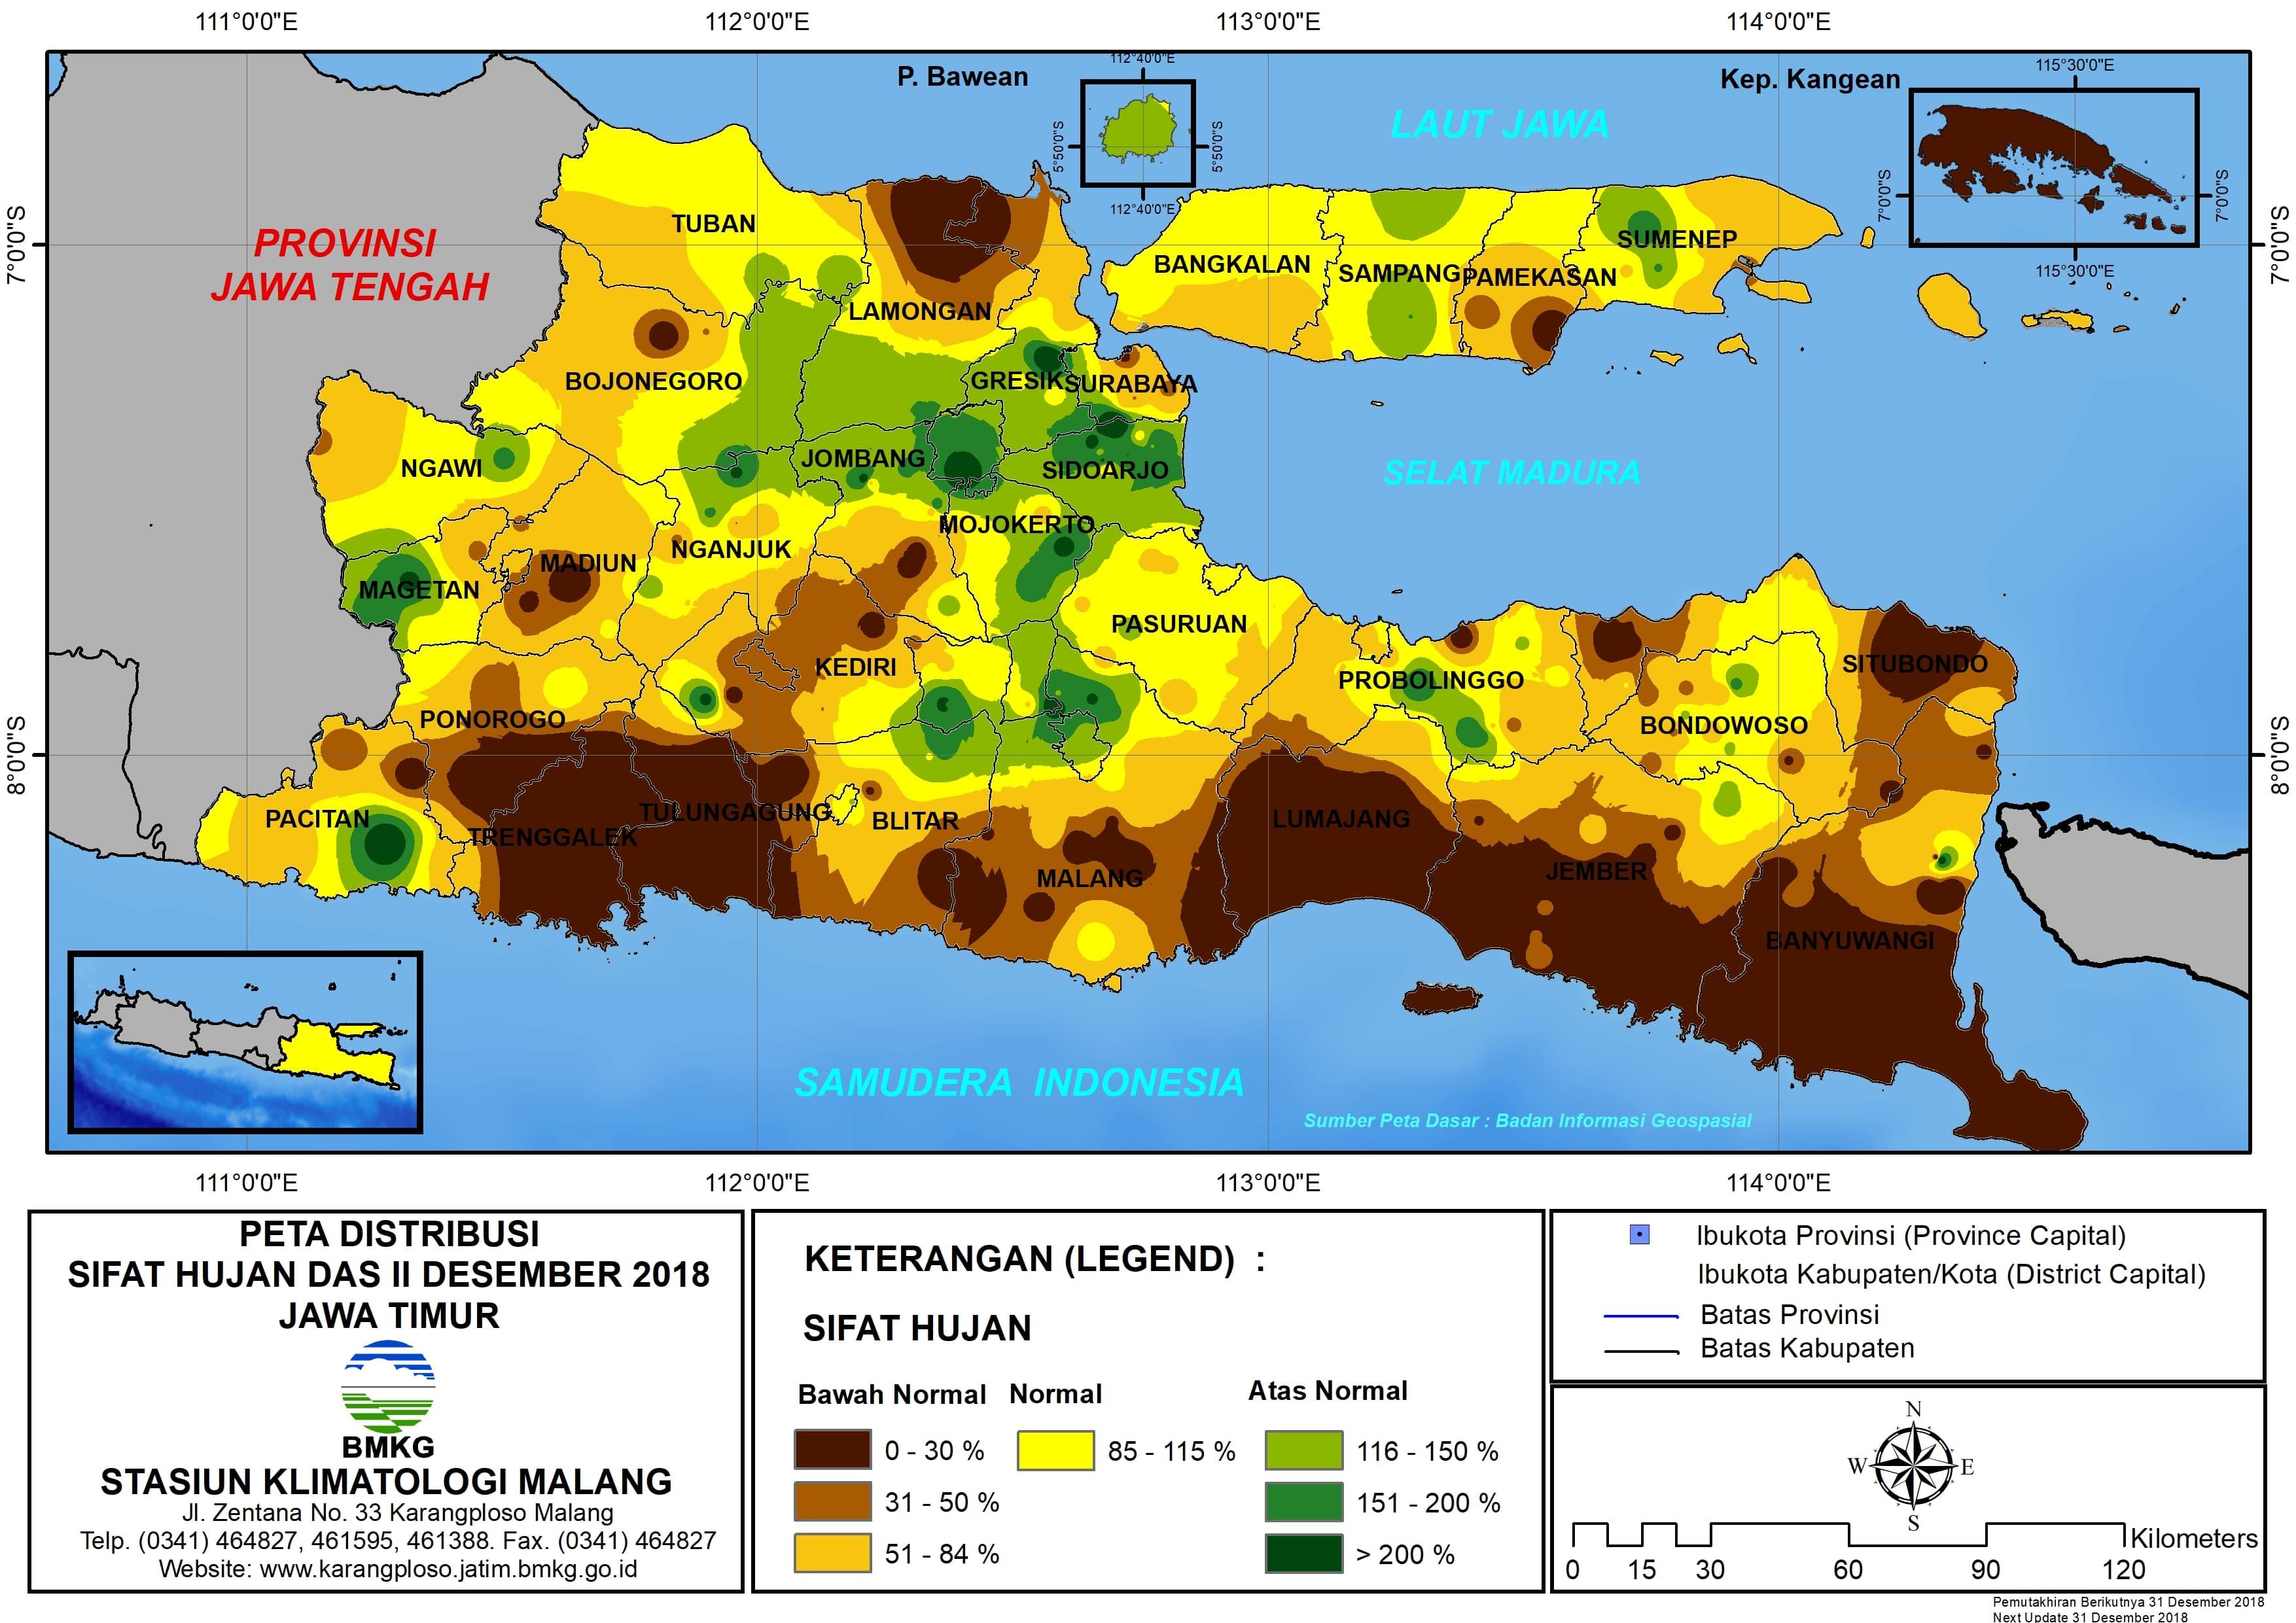 Peta Analisis Distribusi Sifat Hujan Dasarian II Desember 2018 di Provinsi Jawa Timur